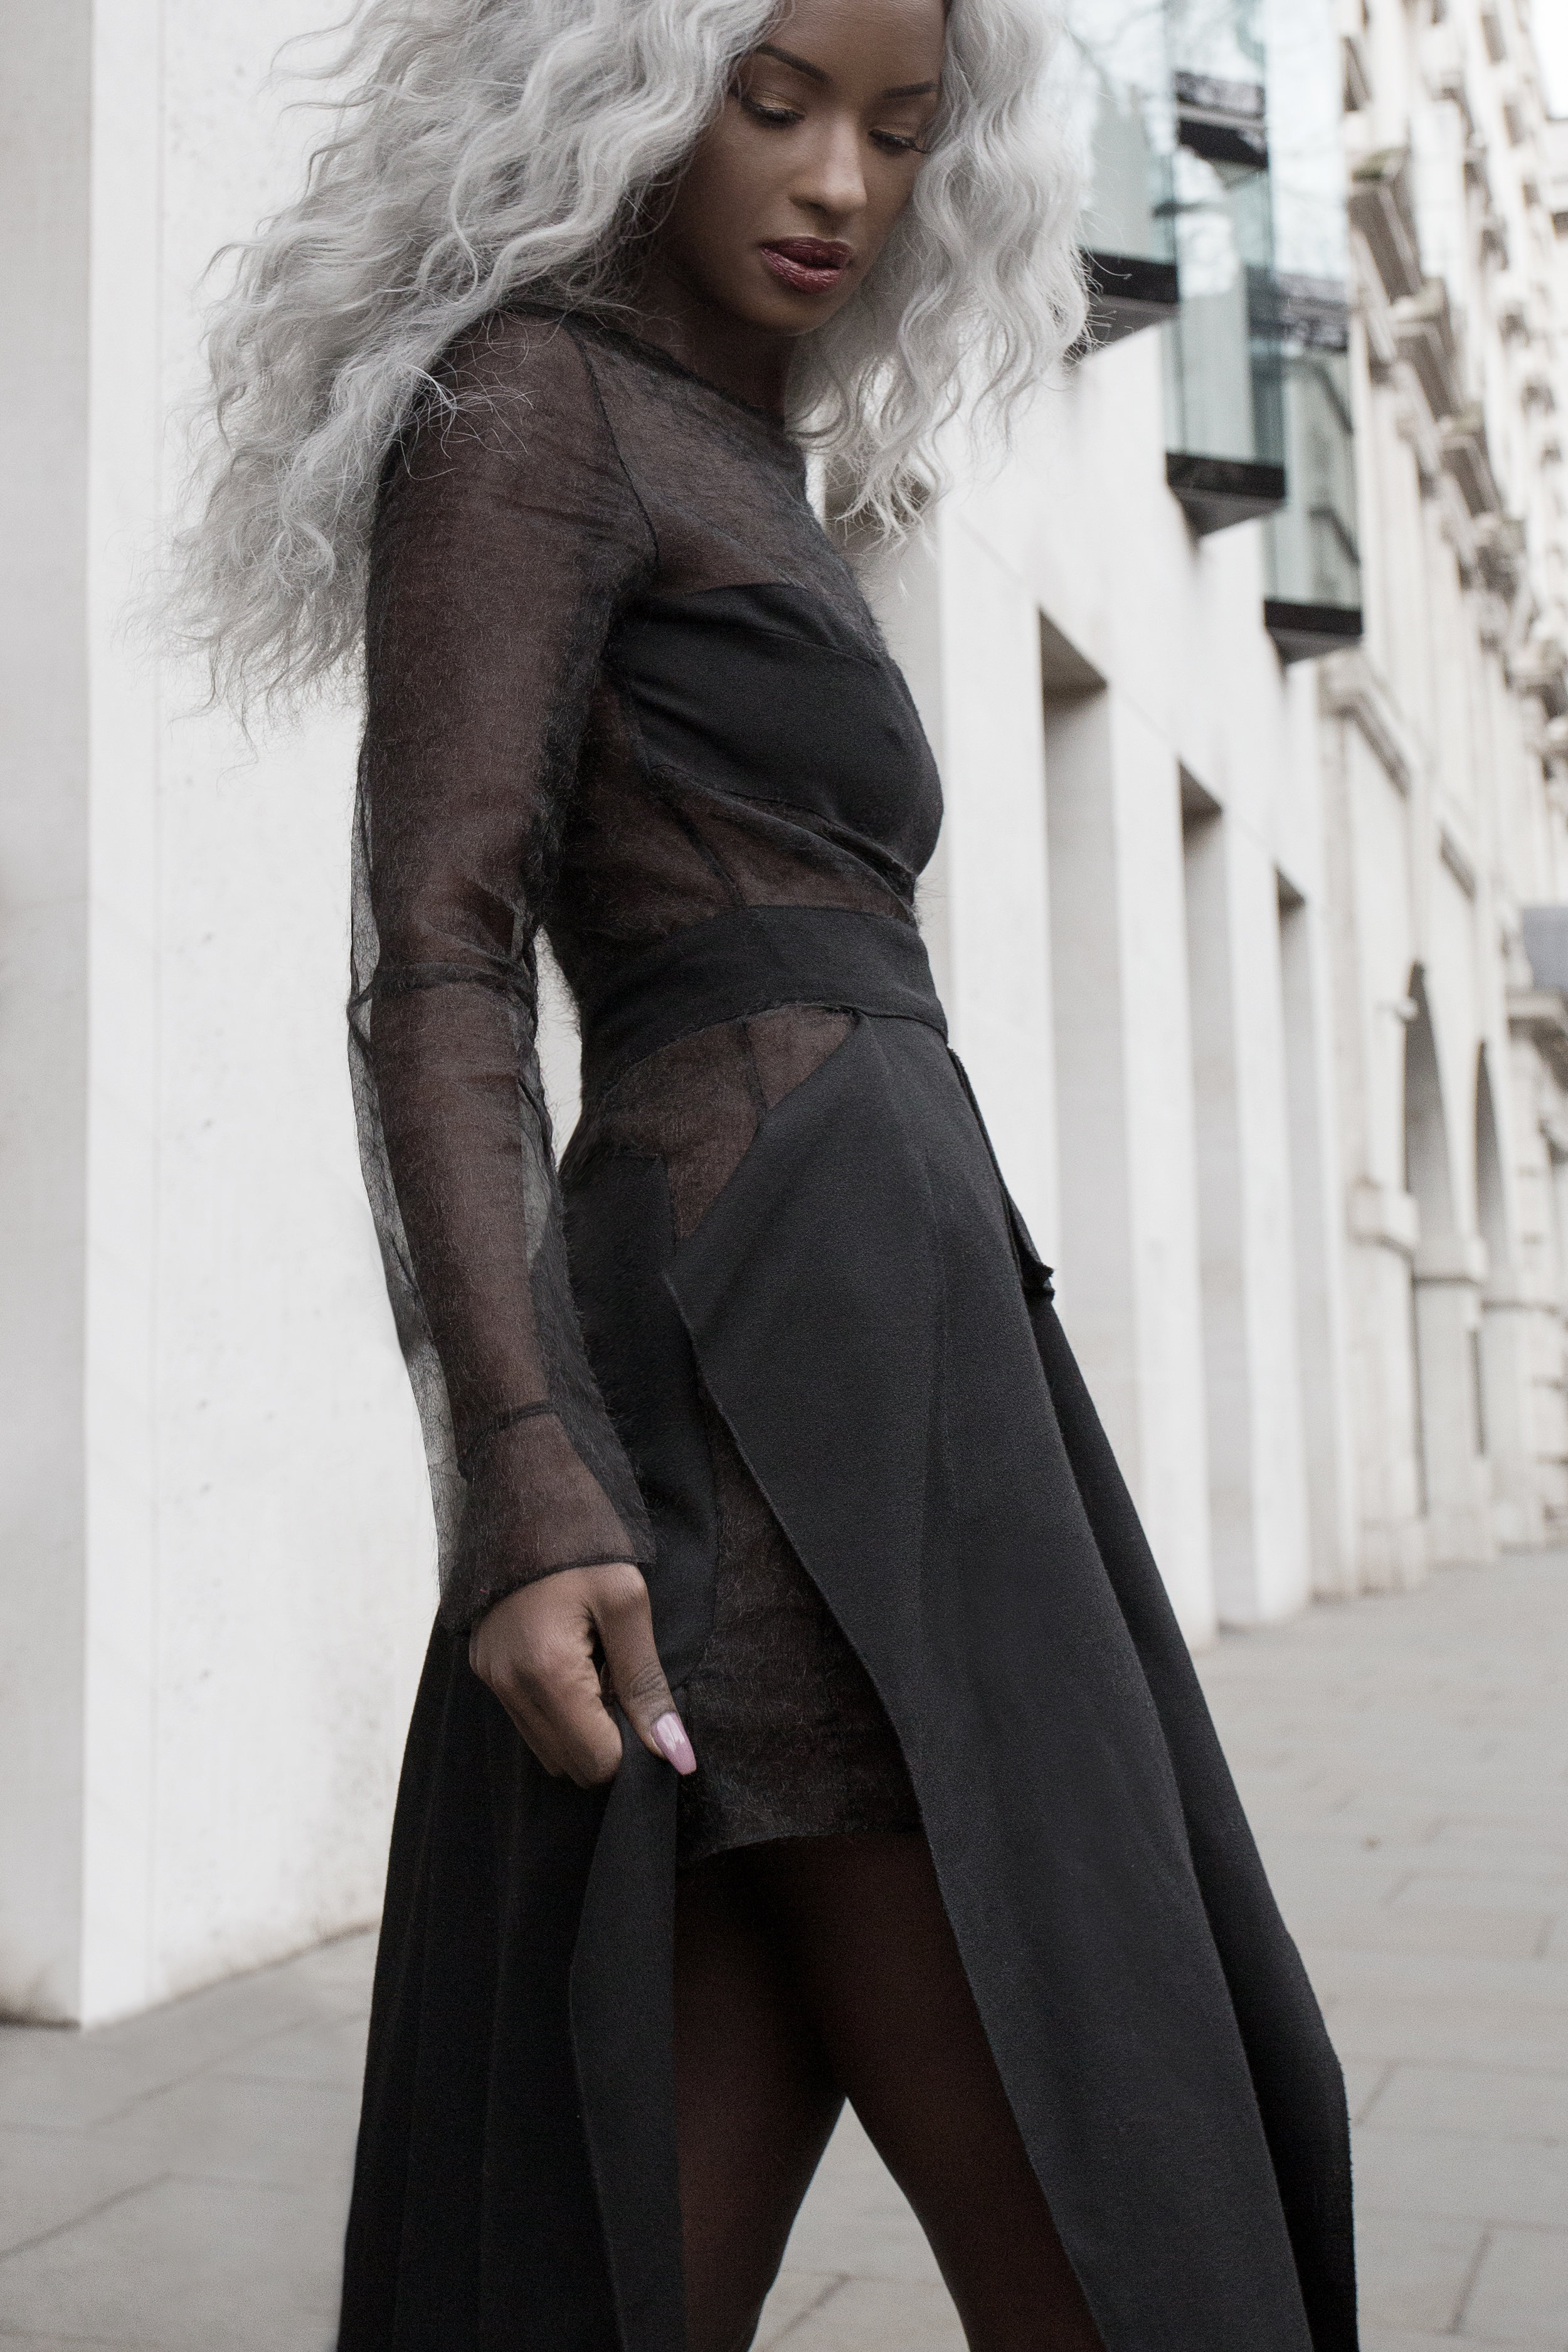 Sarah Mulindwa By Stoyanov & Jones wearing The 7962